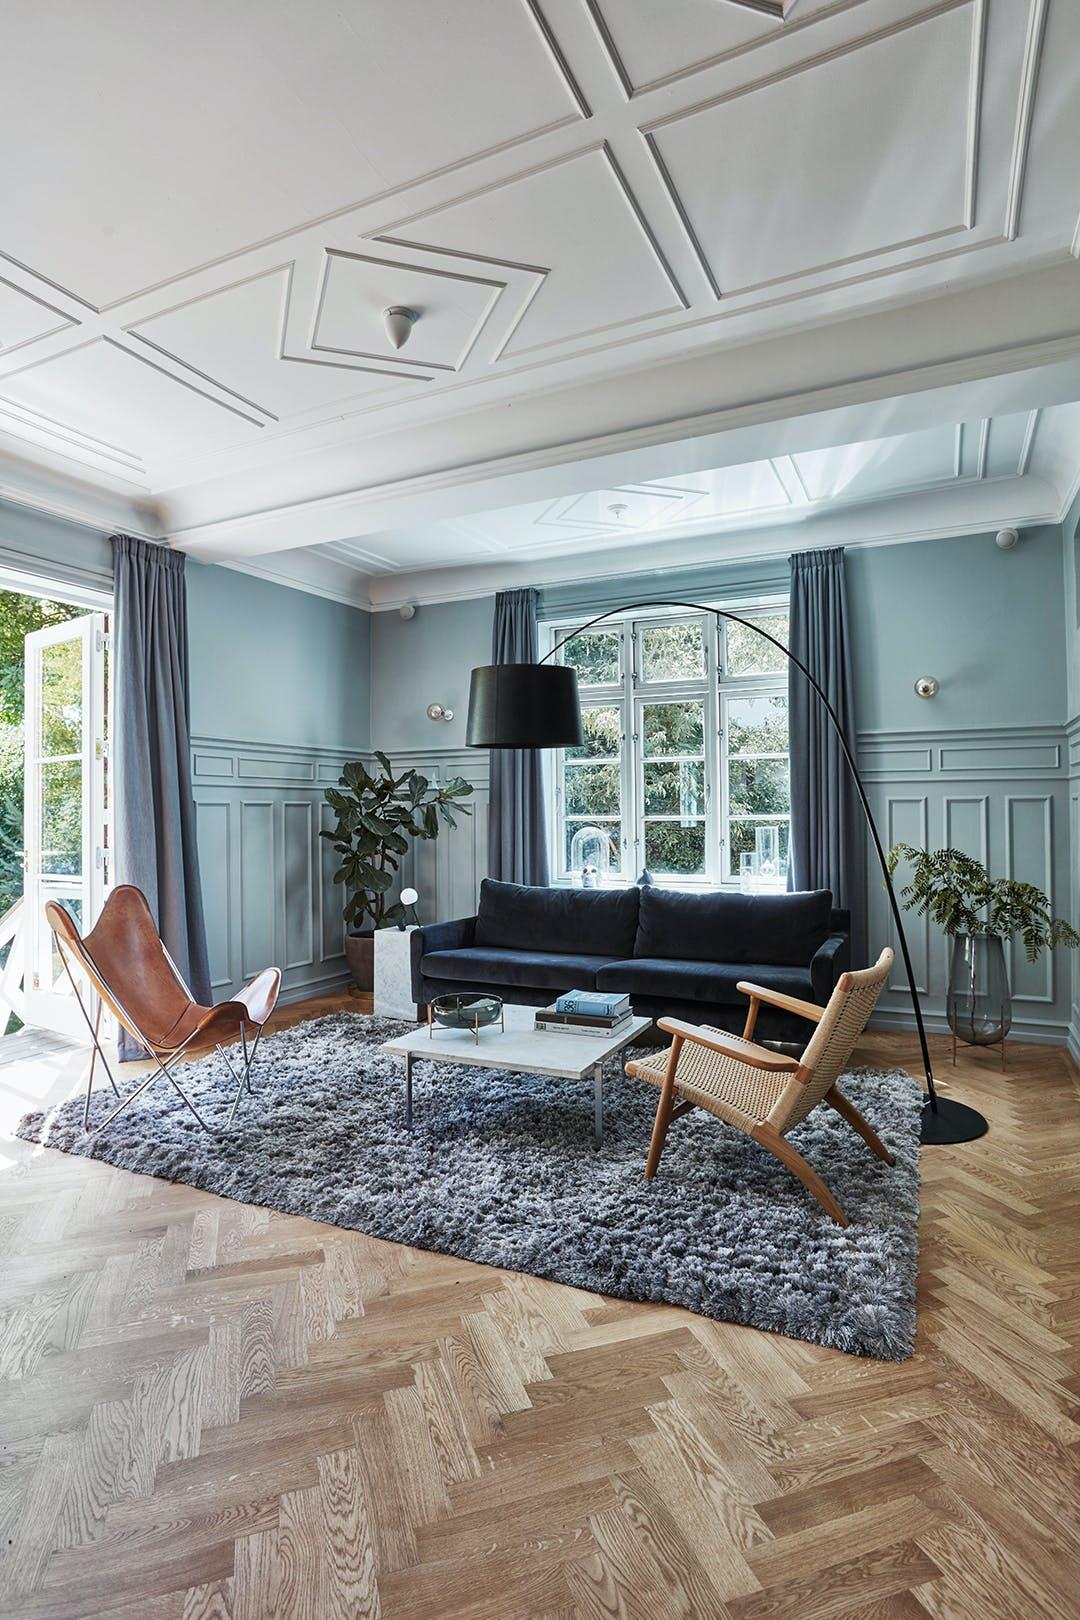 stue dansk design stuebord gulvlampe violinfigen